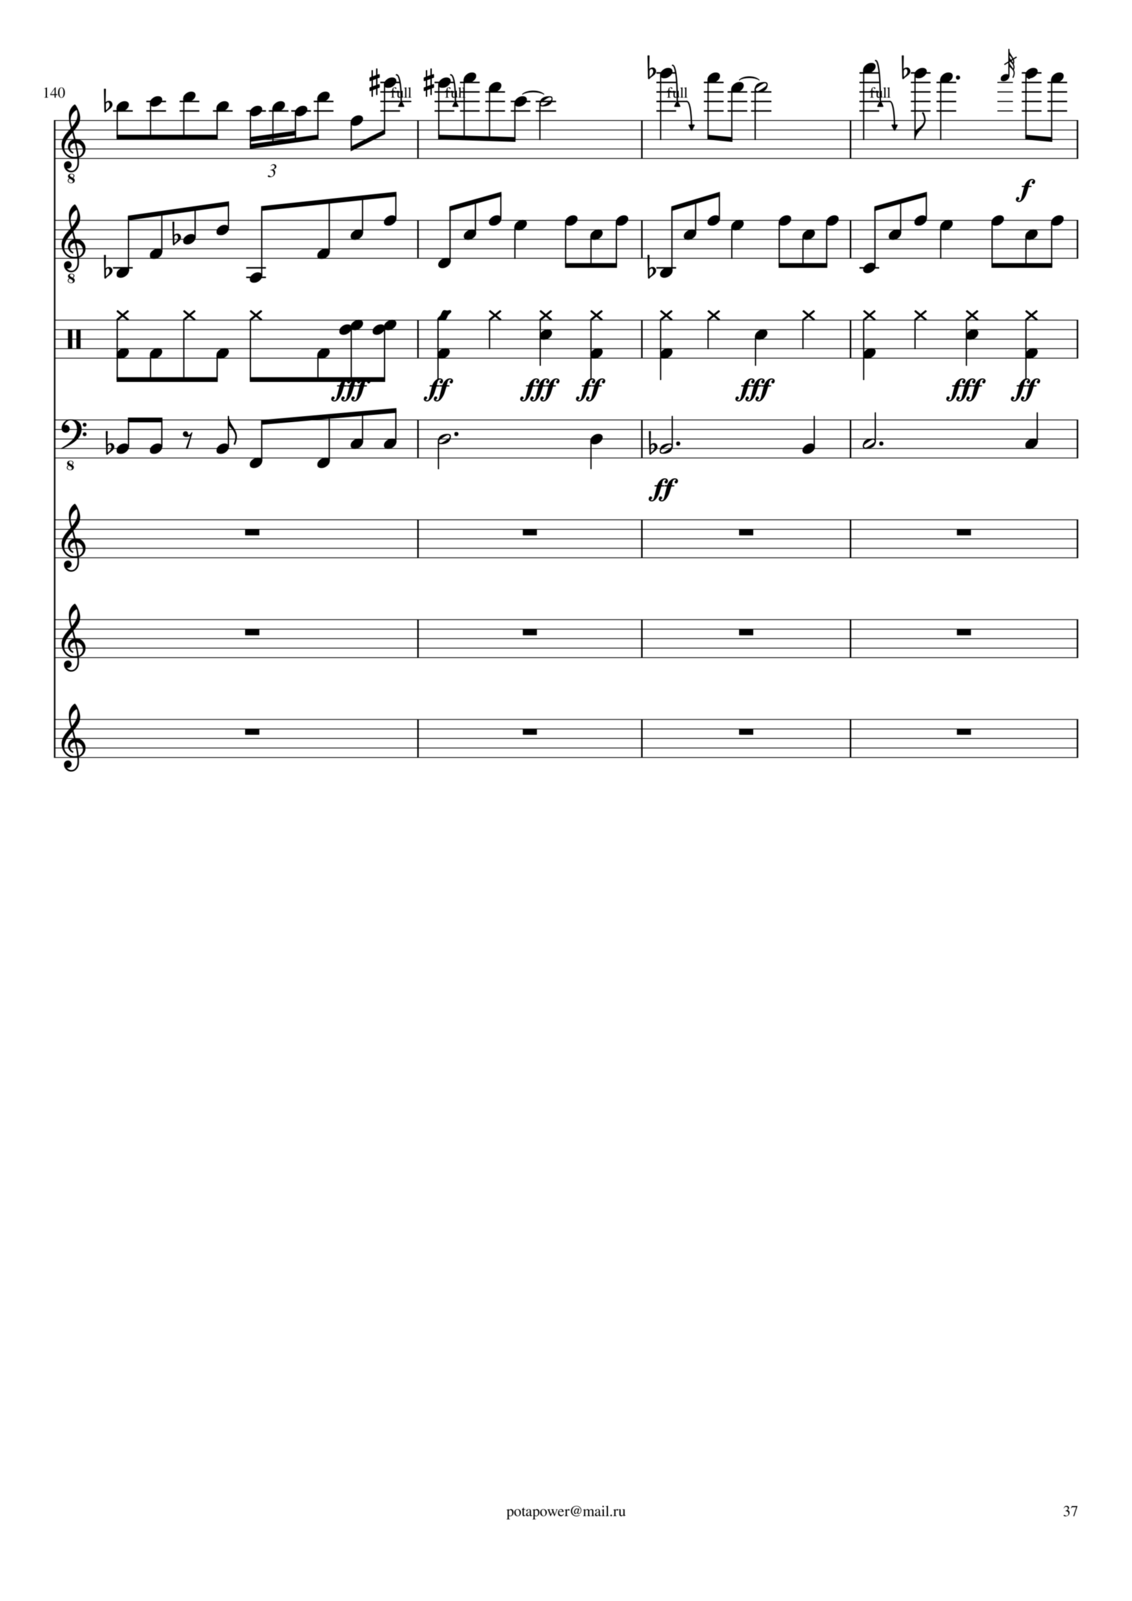 N.A.S.T.YA slide, Image 37